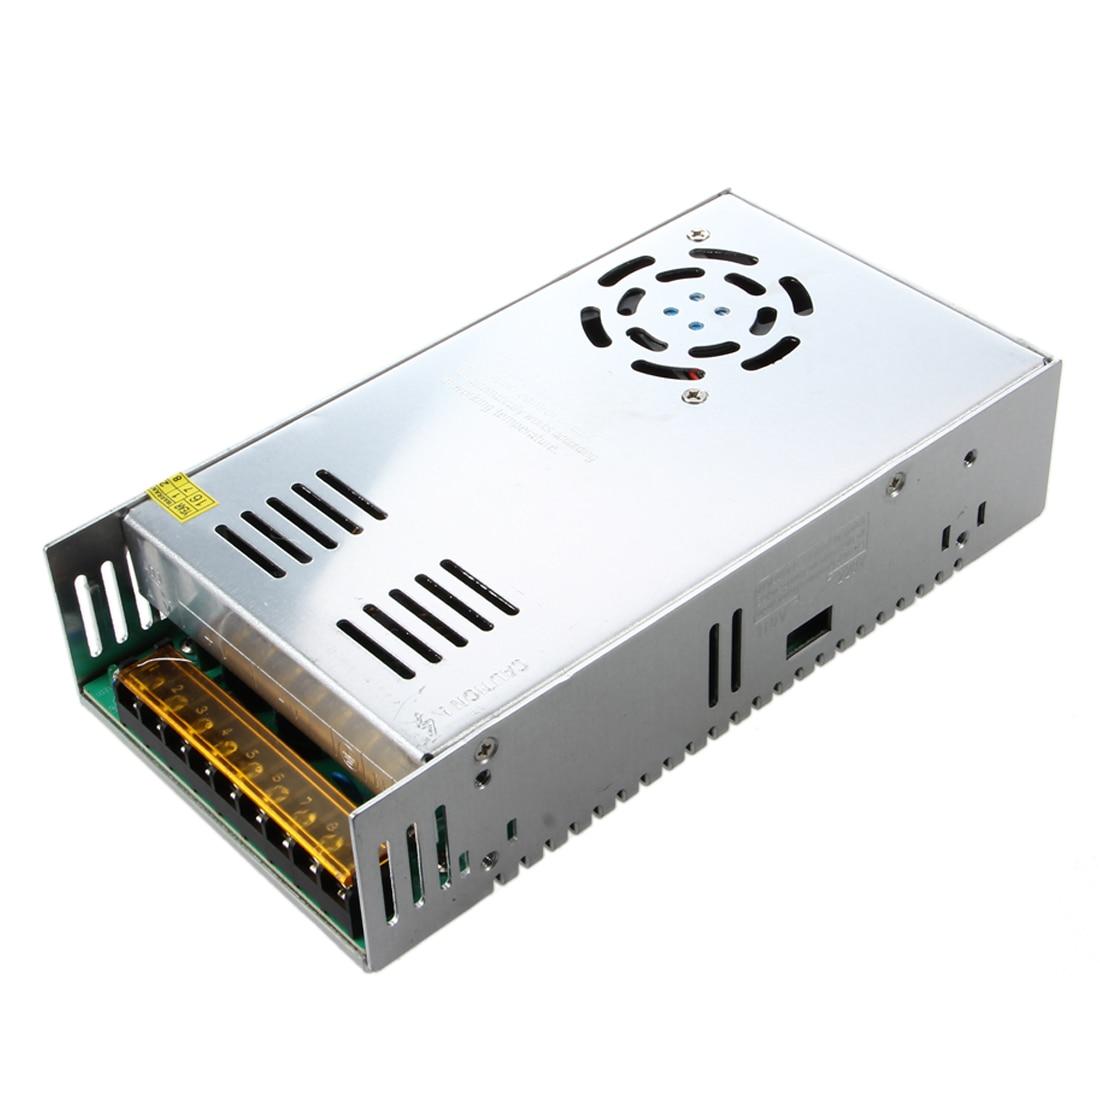 DSHA New Hot 400W Switch Power Supply Driver for LED Strip Light DC 12V 33A ac 85v 265v to 20 38v 600ma power supply driver adapter for led light lamp